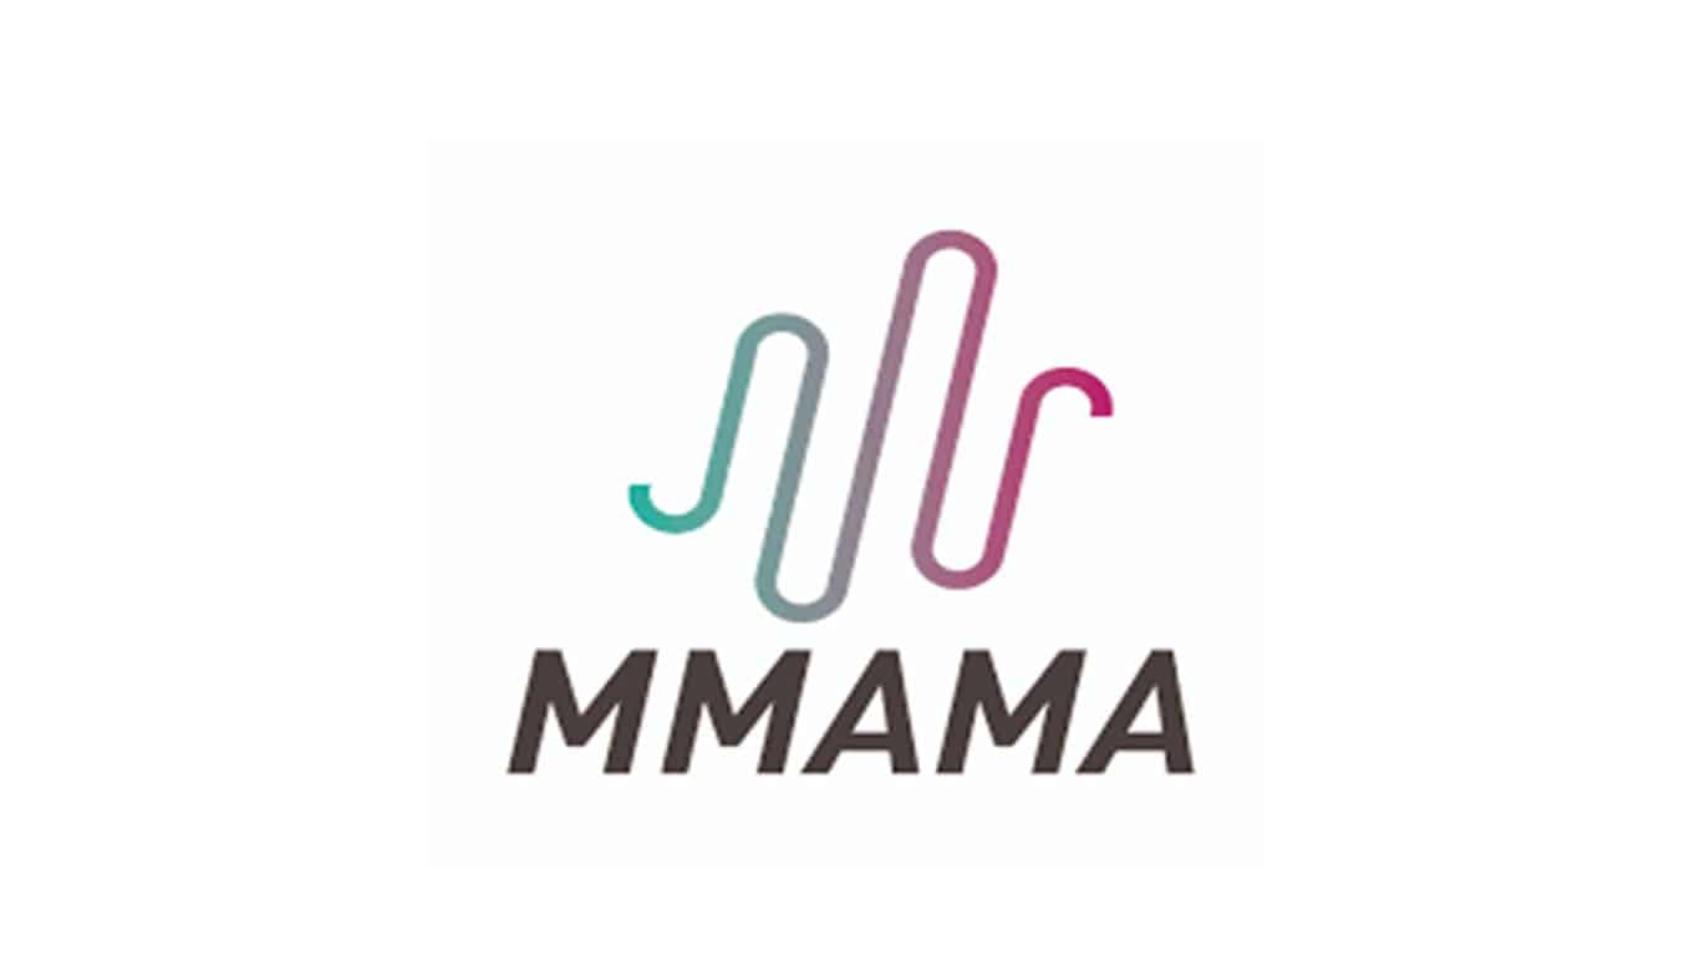 mmama